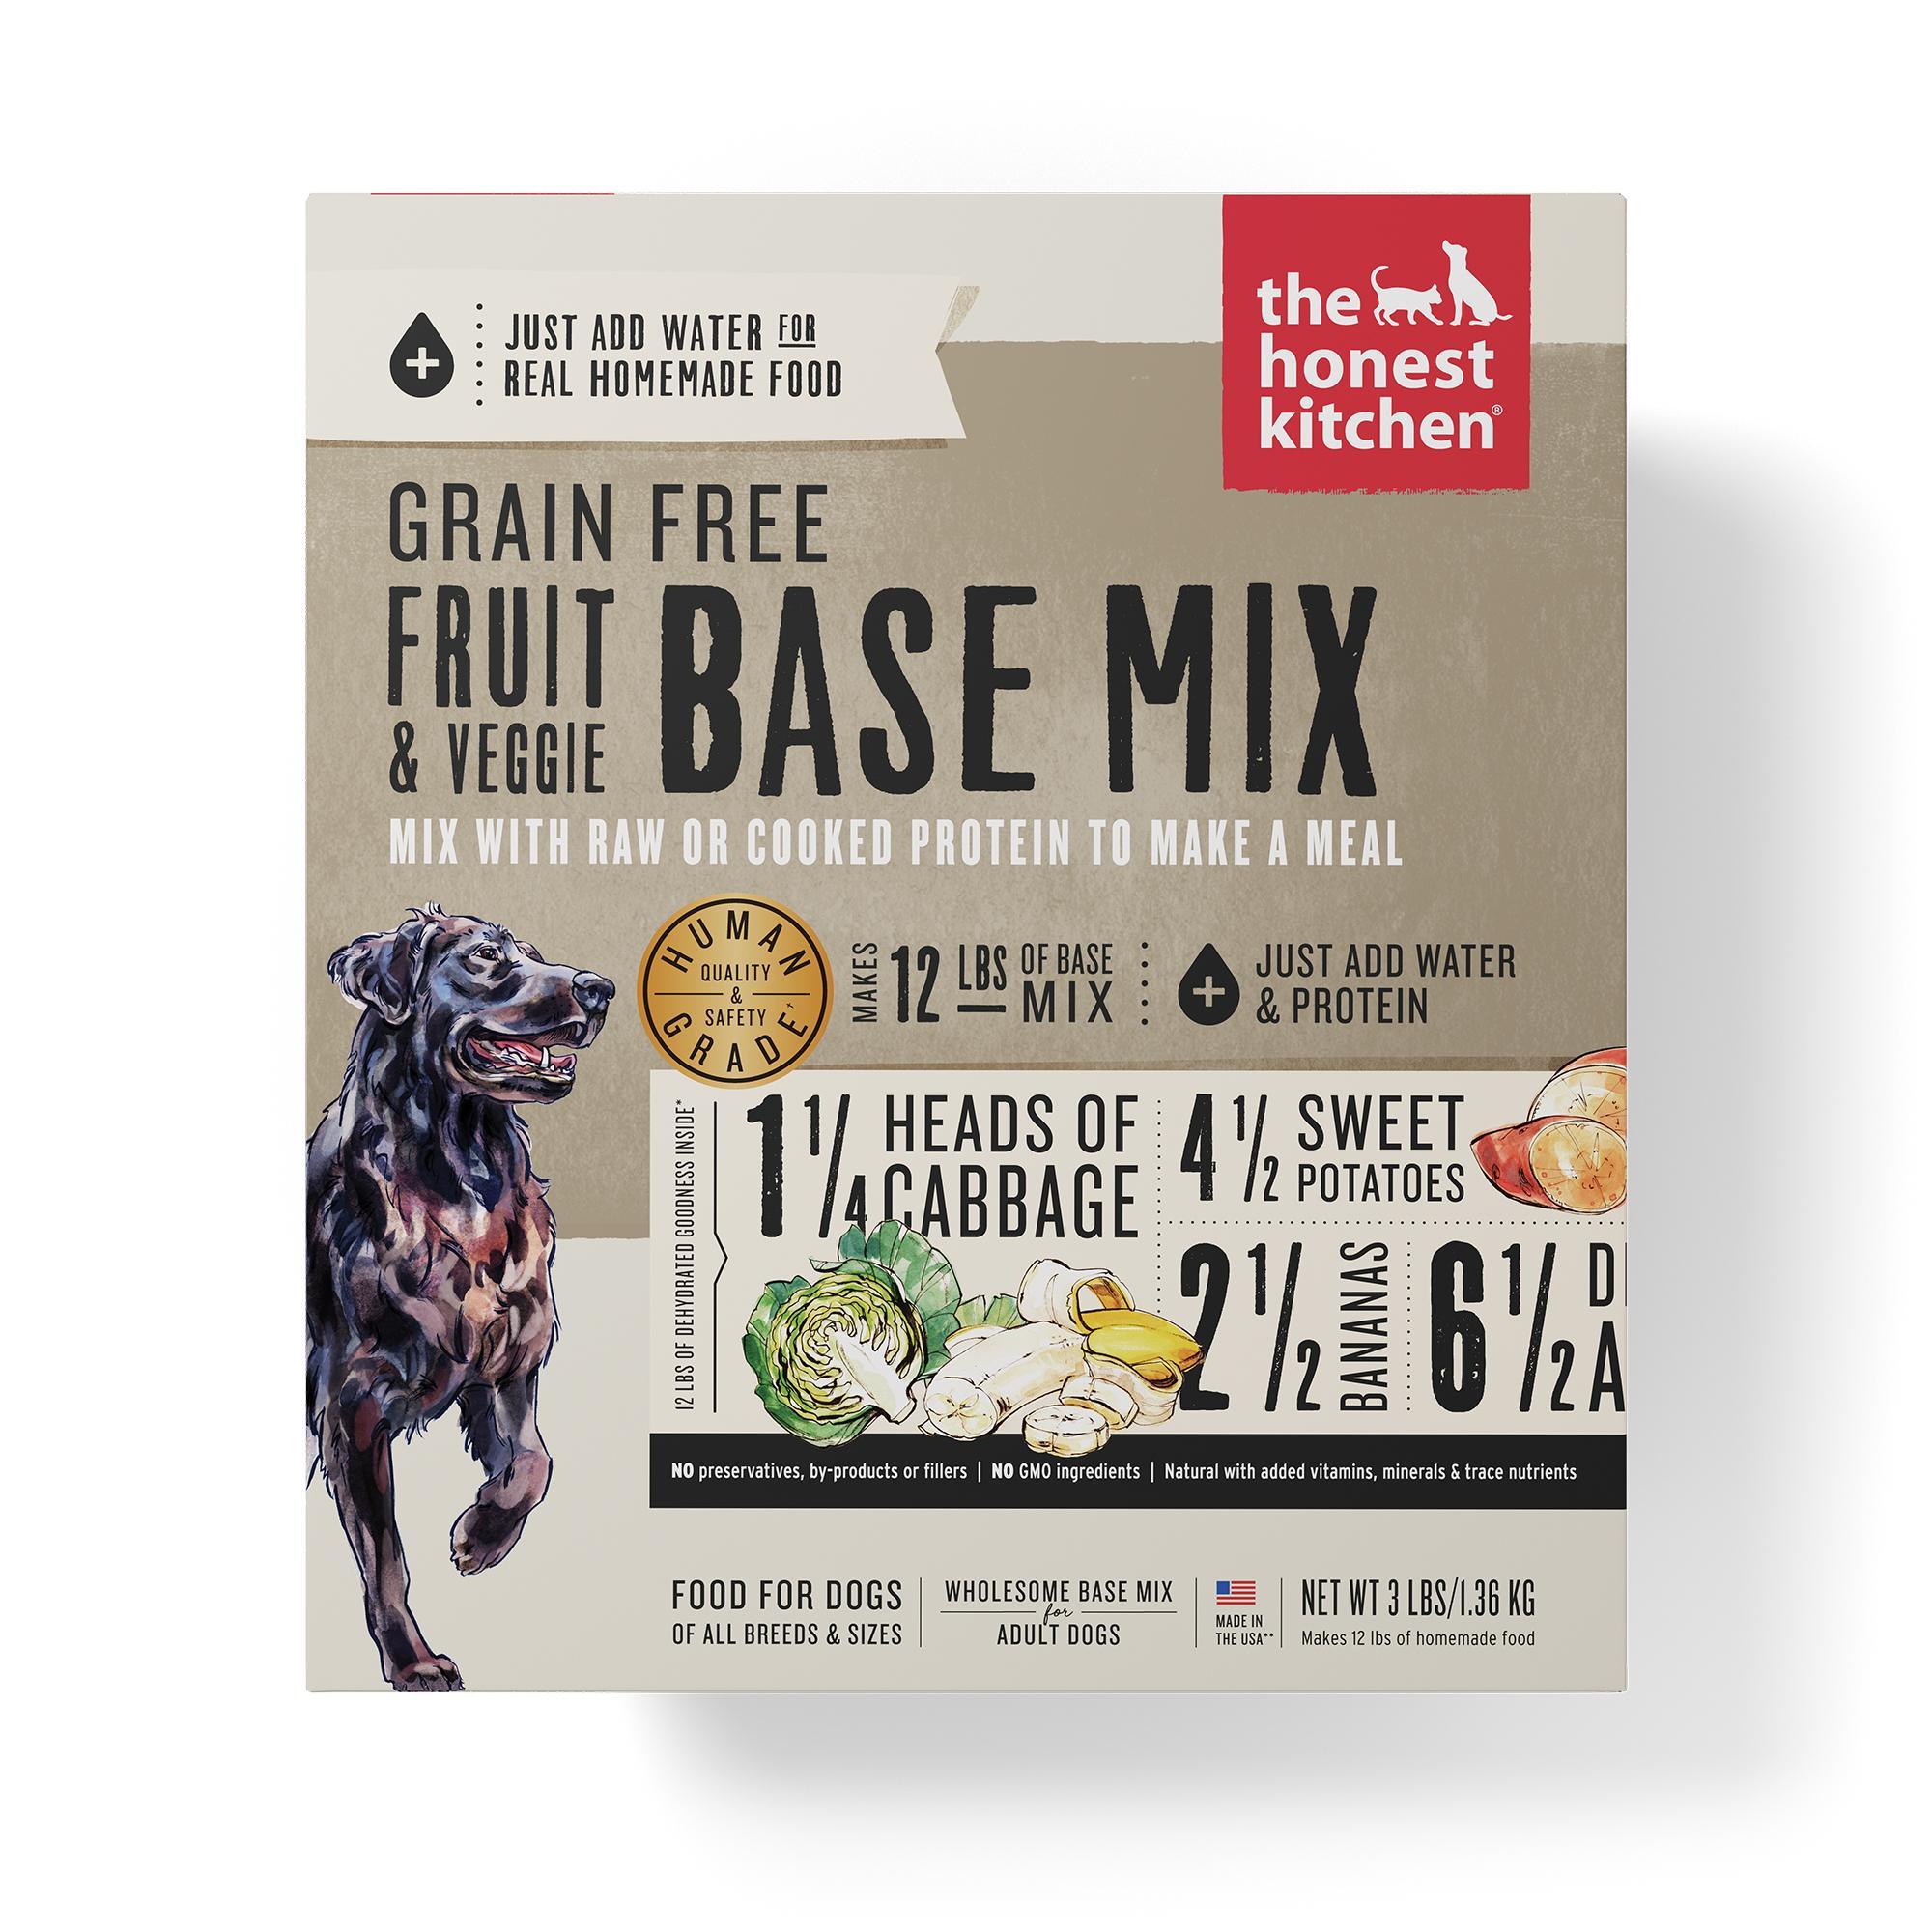 The Honest Kitchen Fruit & Veggie Base Mix Grain-Free Dehydrated Dog Food, 3-lb box